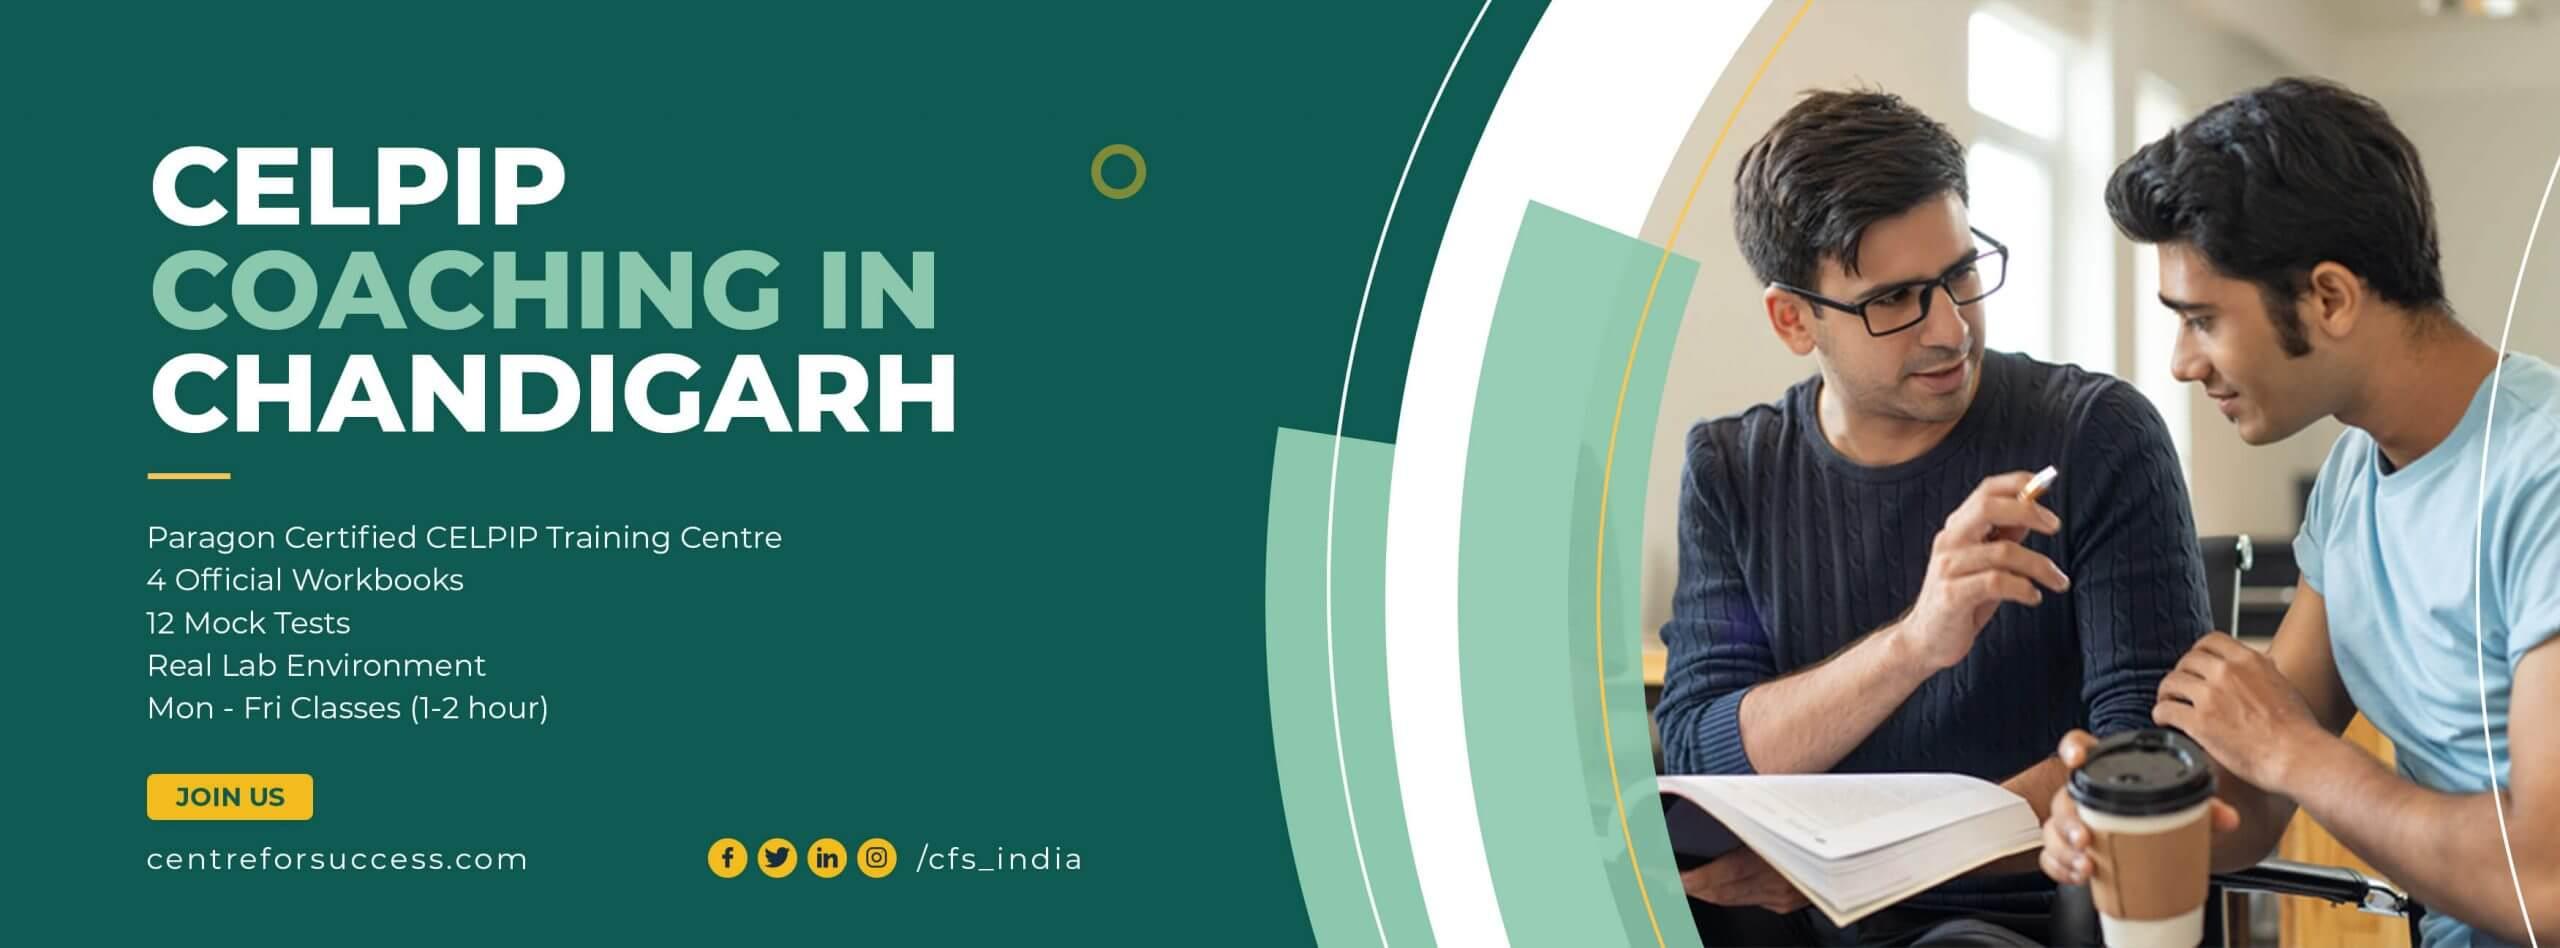 CELPIP Coaching In Chandigarh   CELPIP India